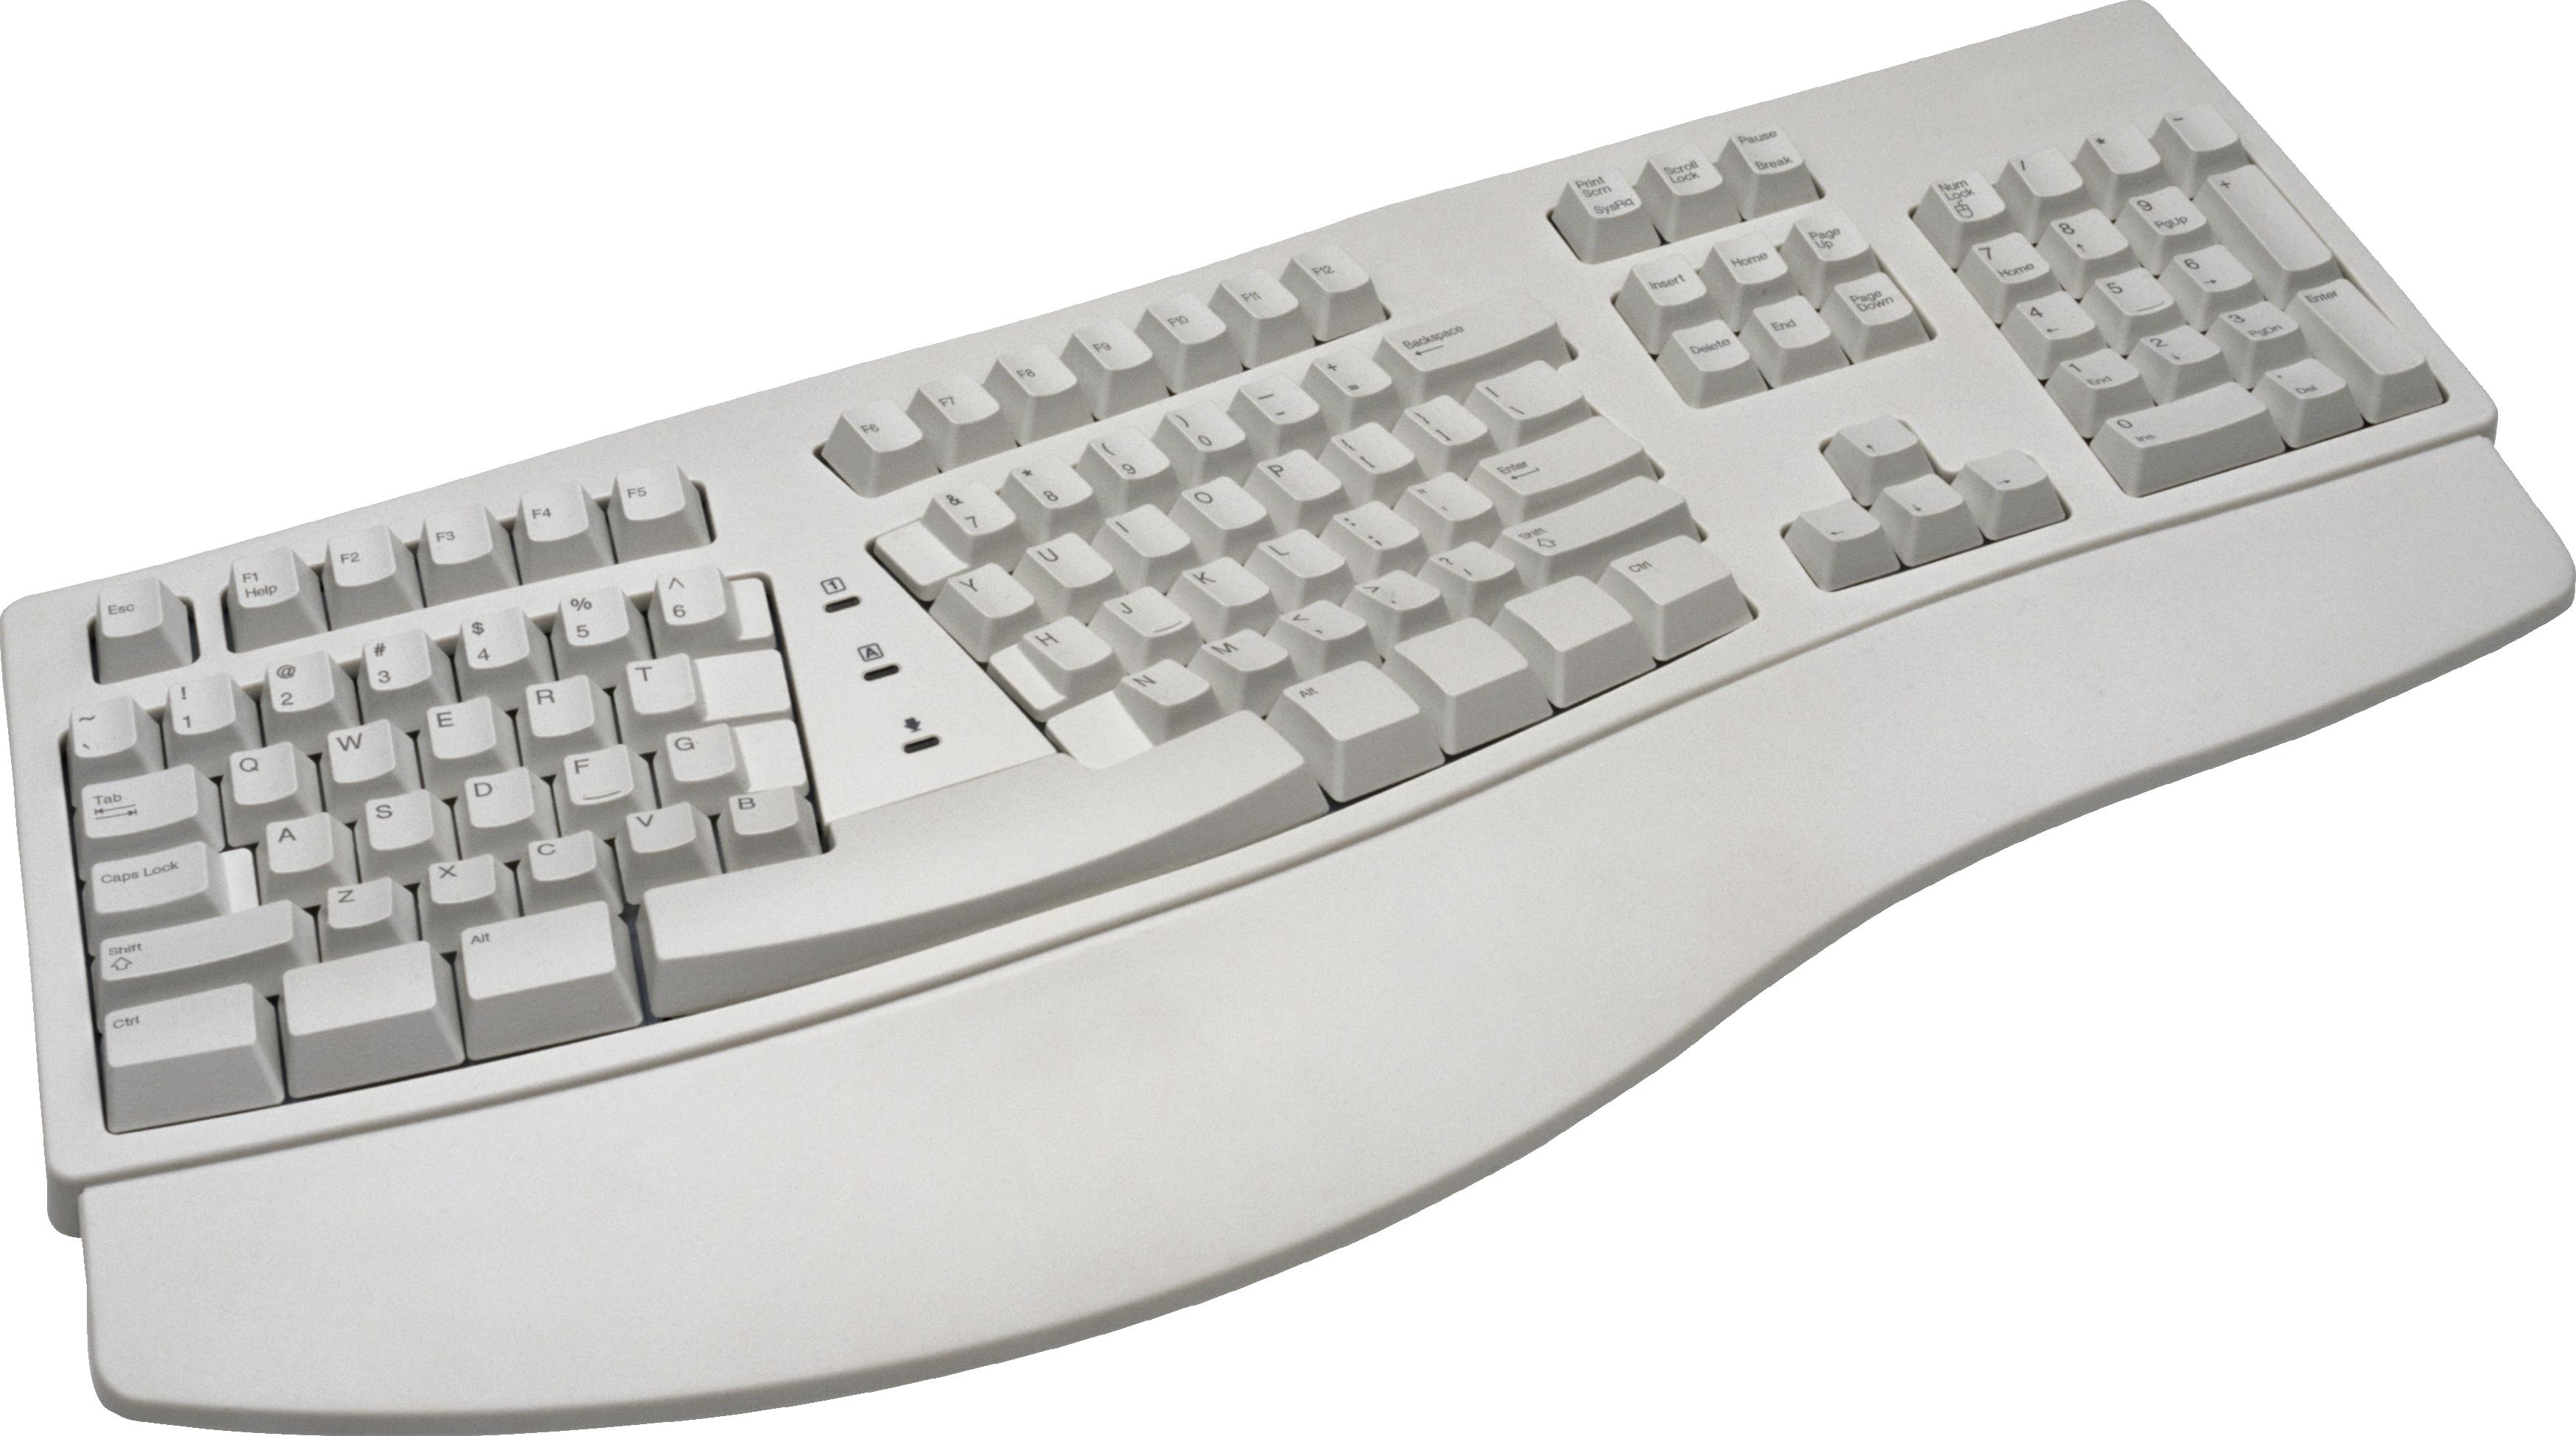 Белая клавиатура PNG фото